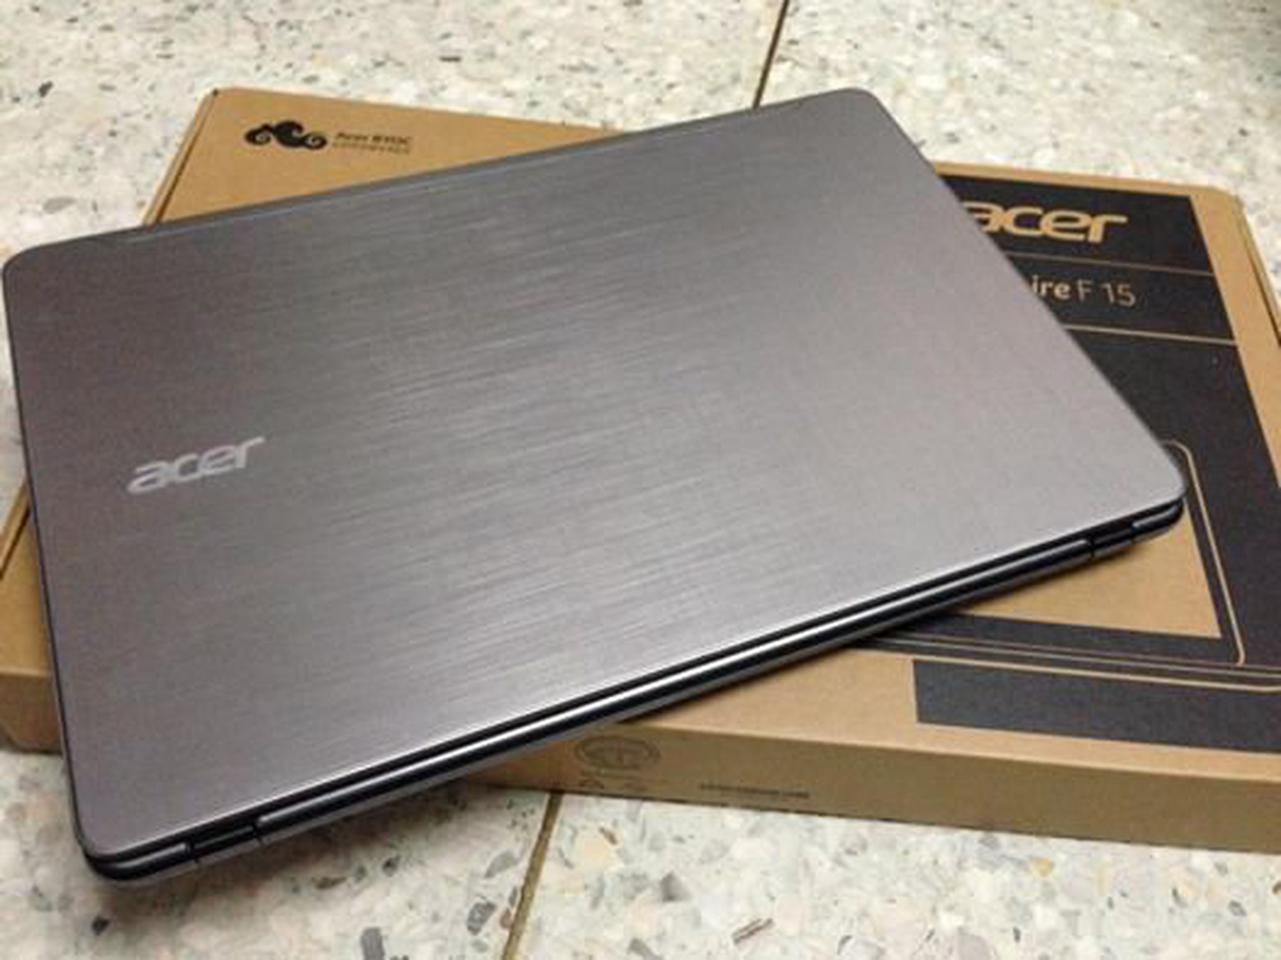 Acer aspire f15 F5-573G-53SJ รูปที่ 1